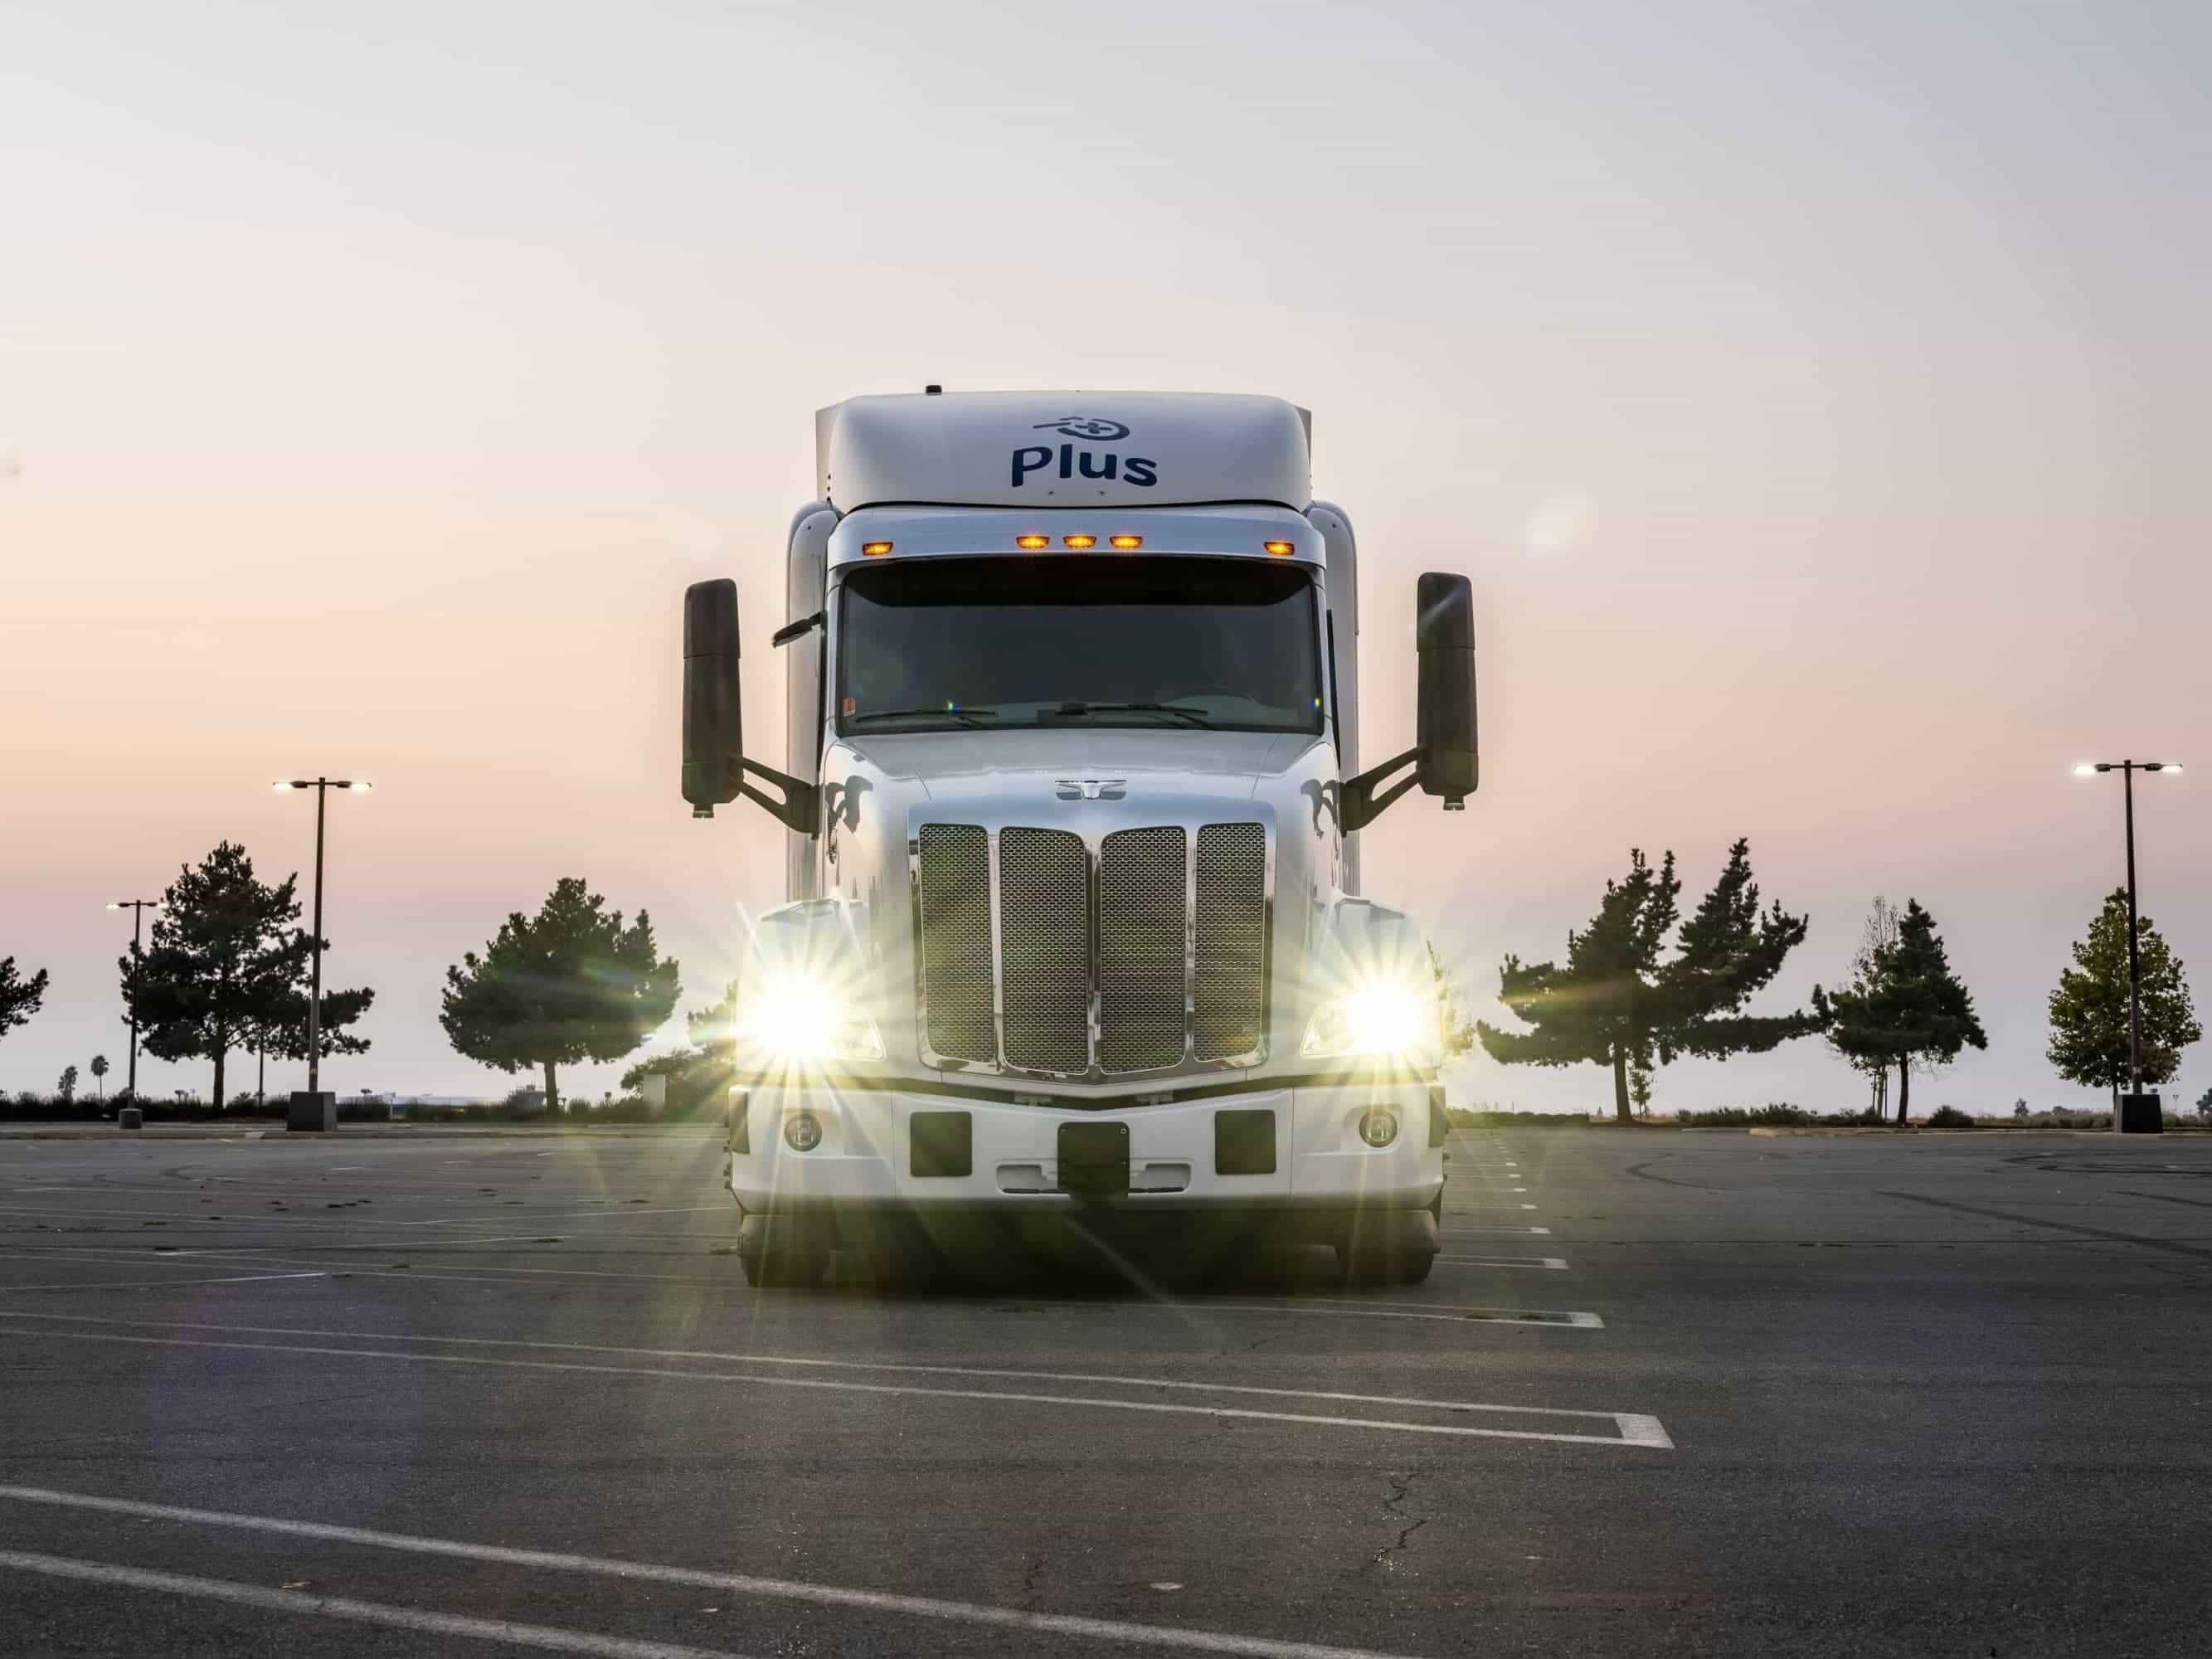 Customer Deliveries Start in 2021